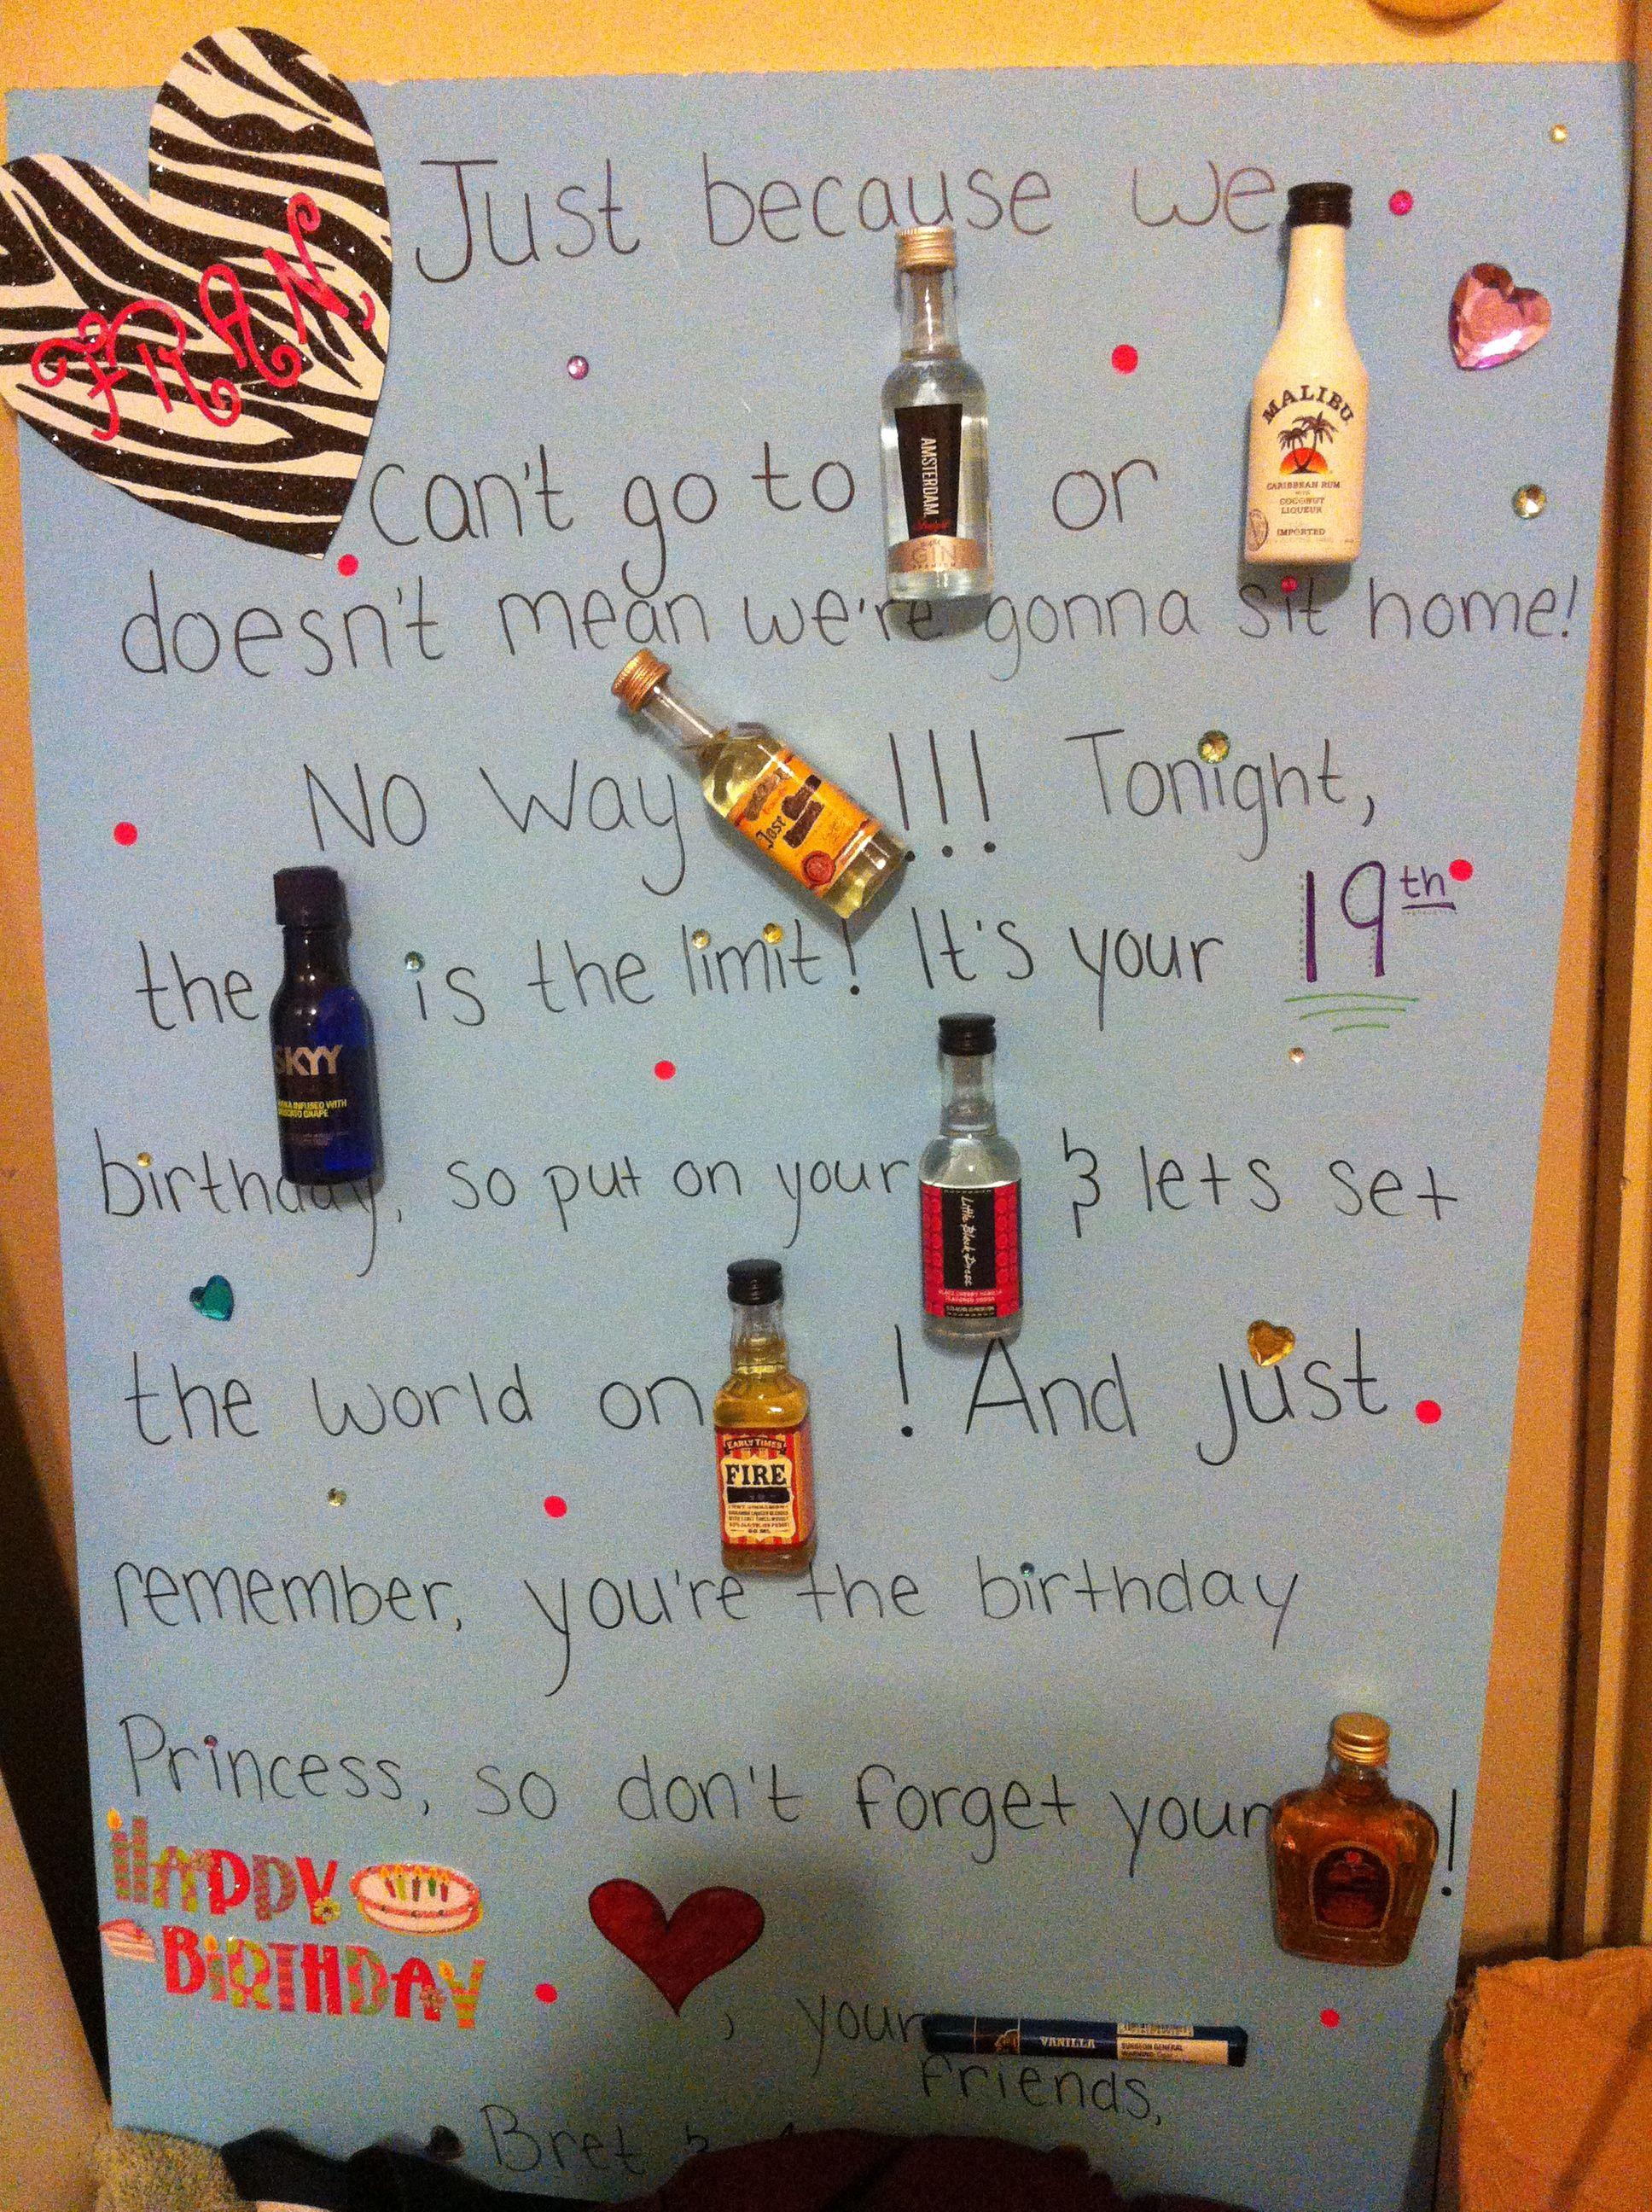 Mad Libs Birthday Card Mini Alcohol Bottles Candy Birthday Cards 35th Birthday Gifts Alcohol Gifts